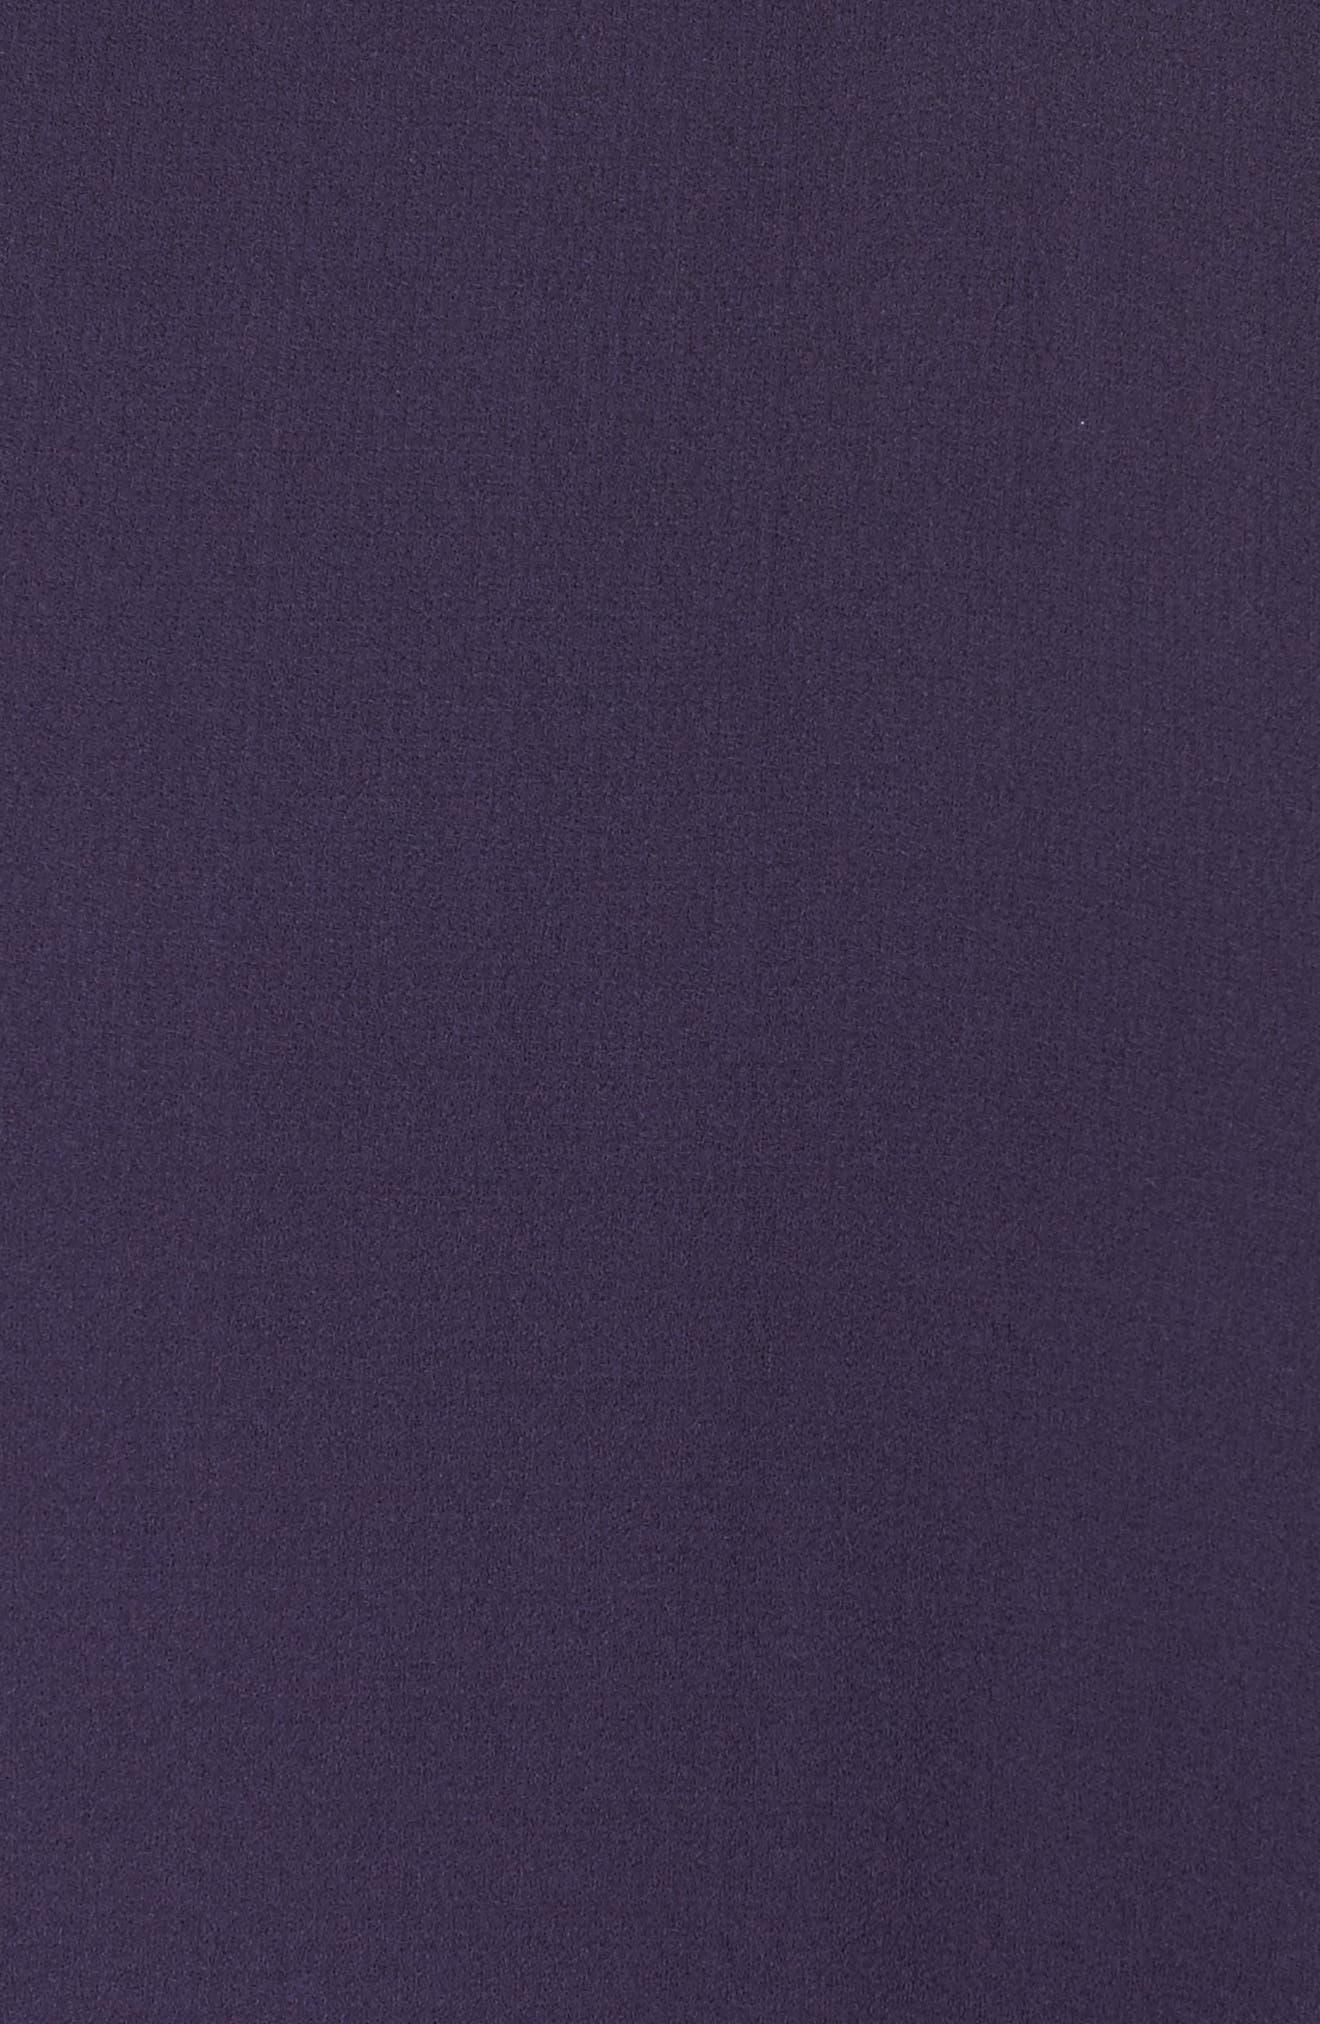 Flare Sleeve Silk Shift Dress,                             Alternate thumbnail 5, color,                             Salt Lake